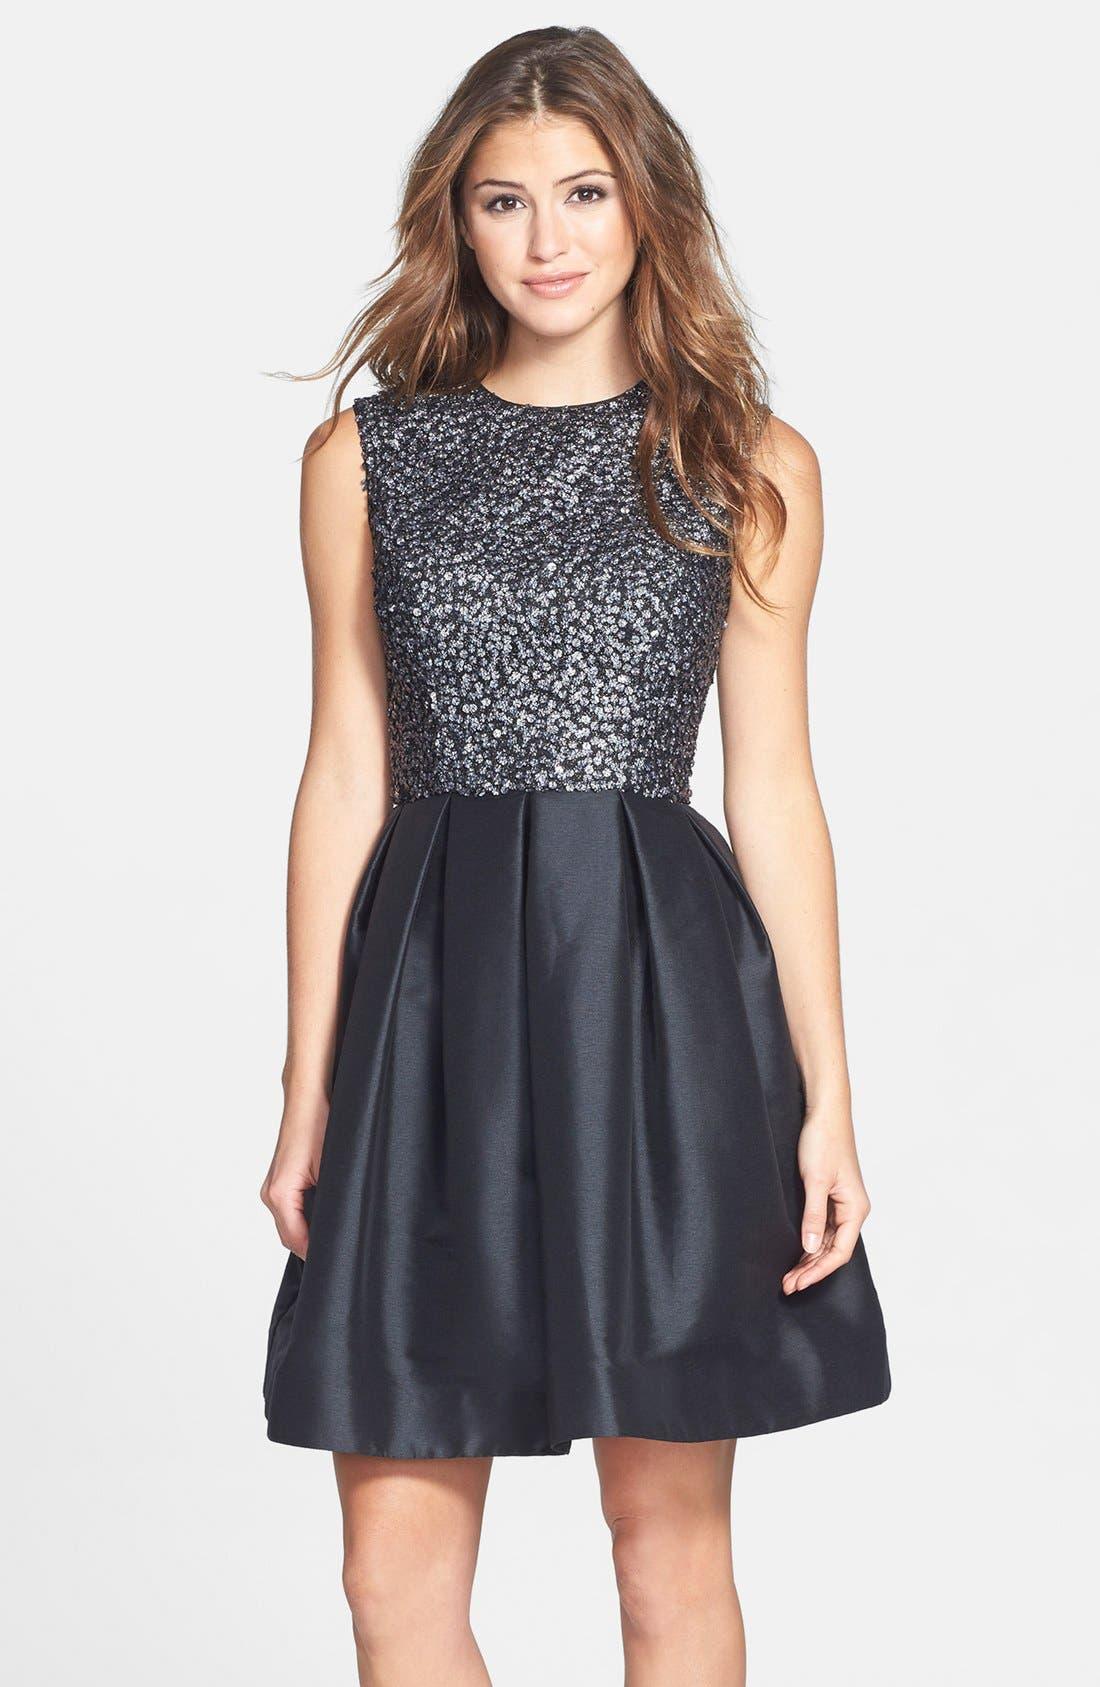 Main Image - ML Monique Lhuillier Embellished Fit & Flare Dress